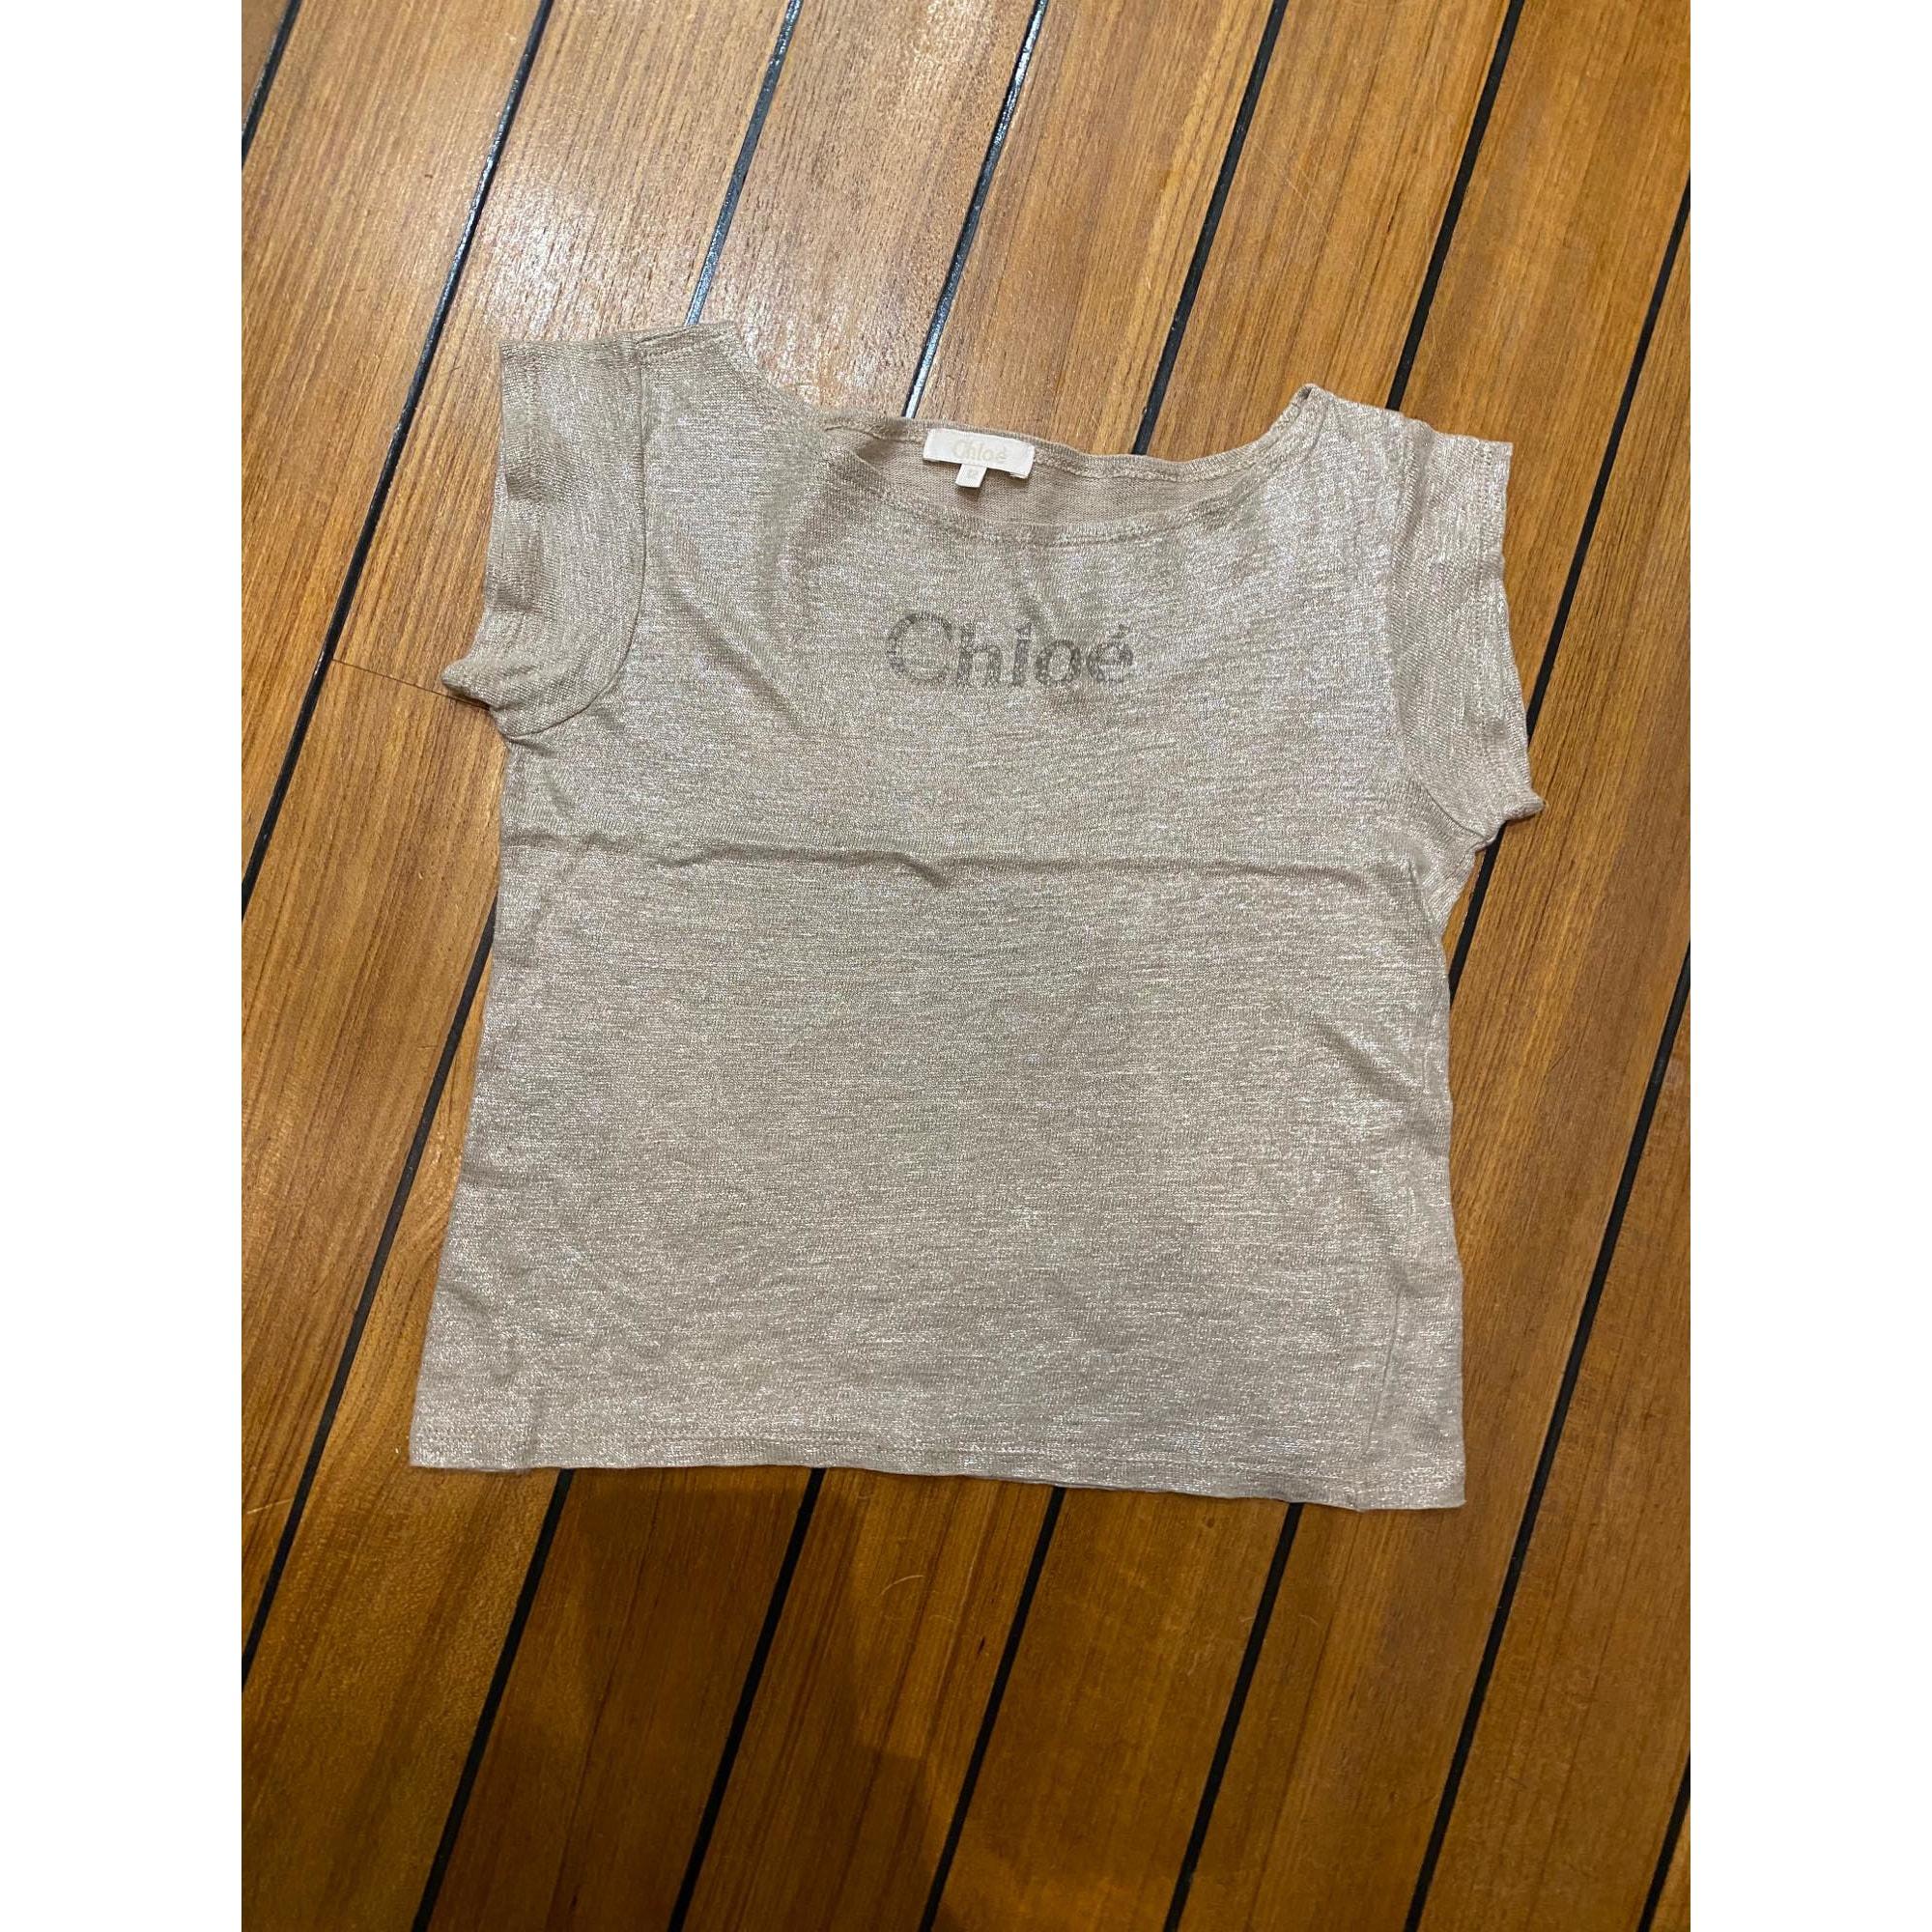 Top, Tee-shirt CHLOÉ Doré, bronze, cuivre